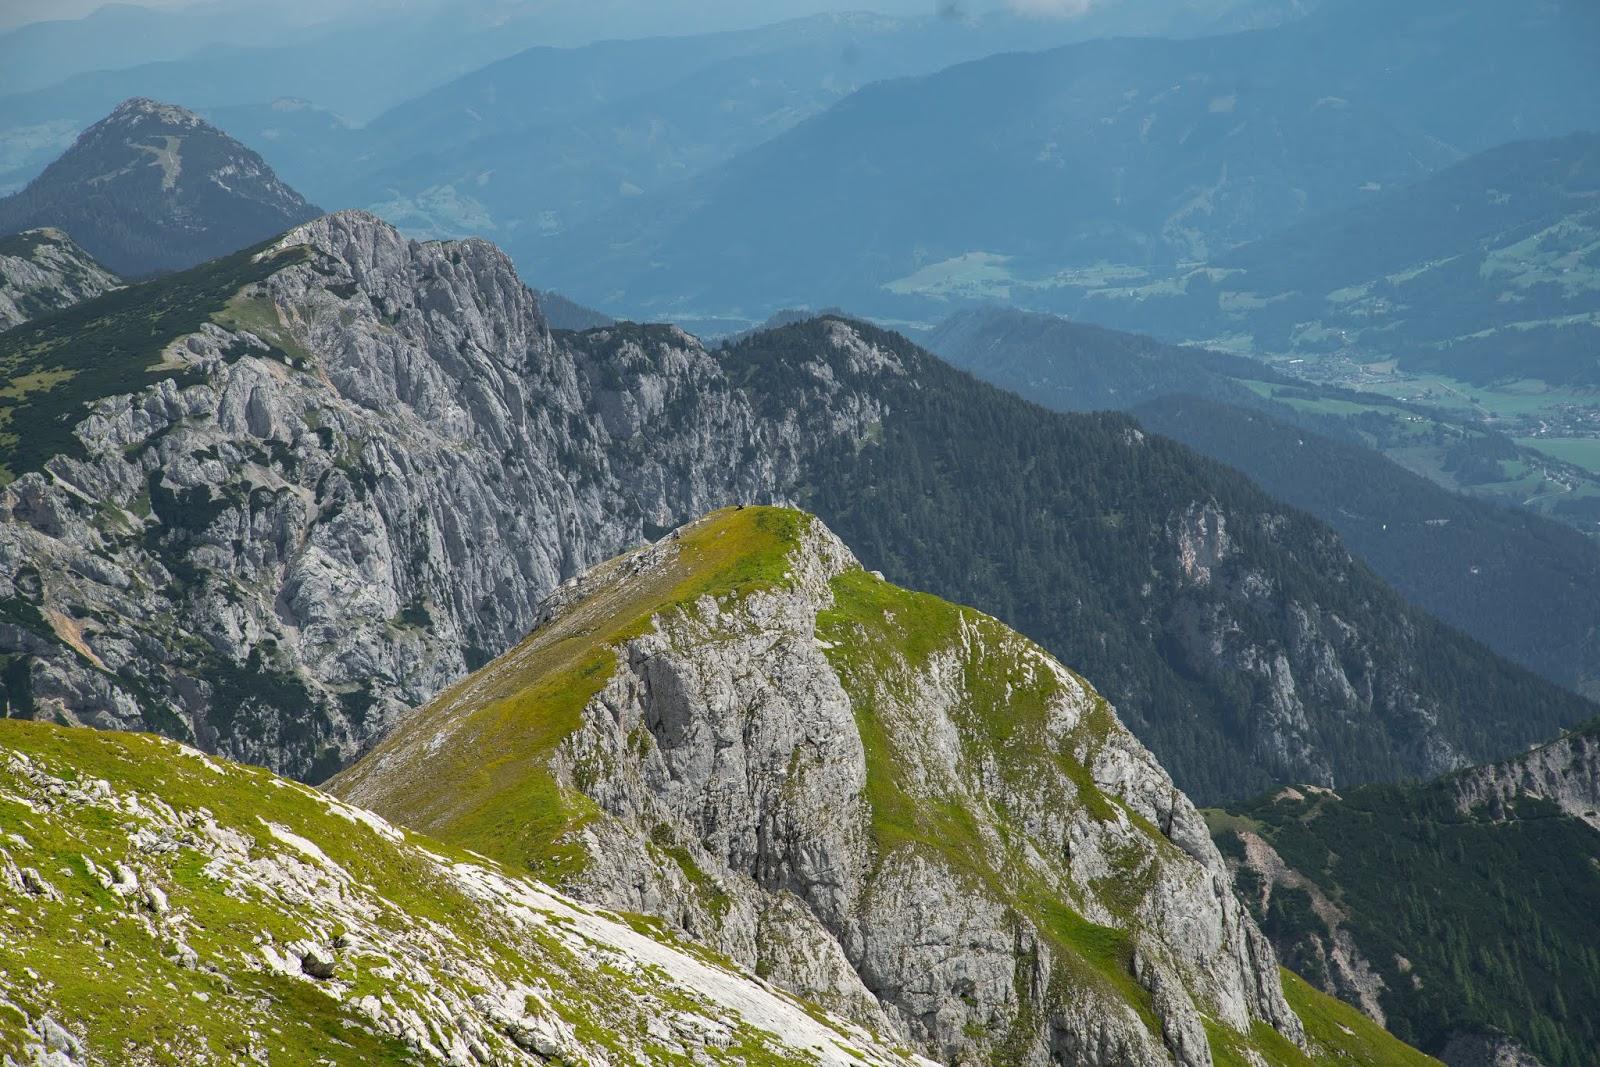 Klettersteig Ramsau : Königsetappe u2013 austria sinabell klettersteig und silberkarsee